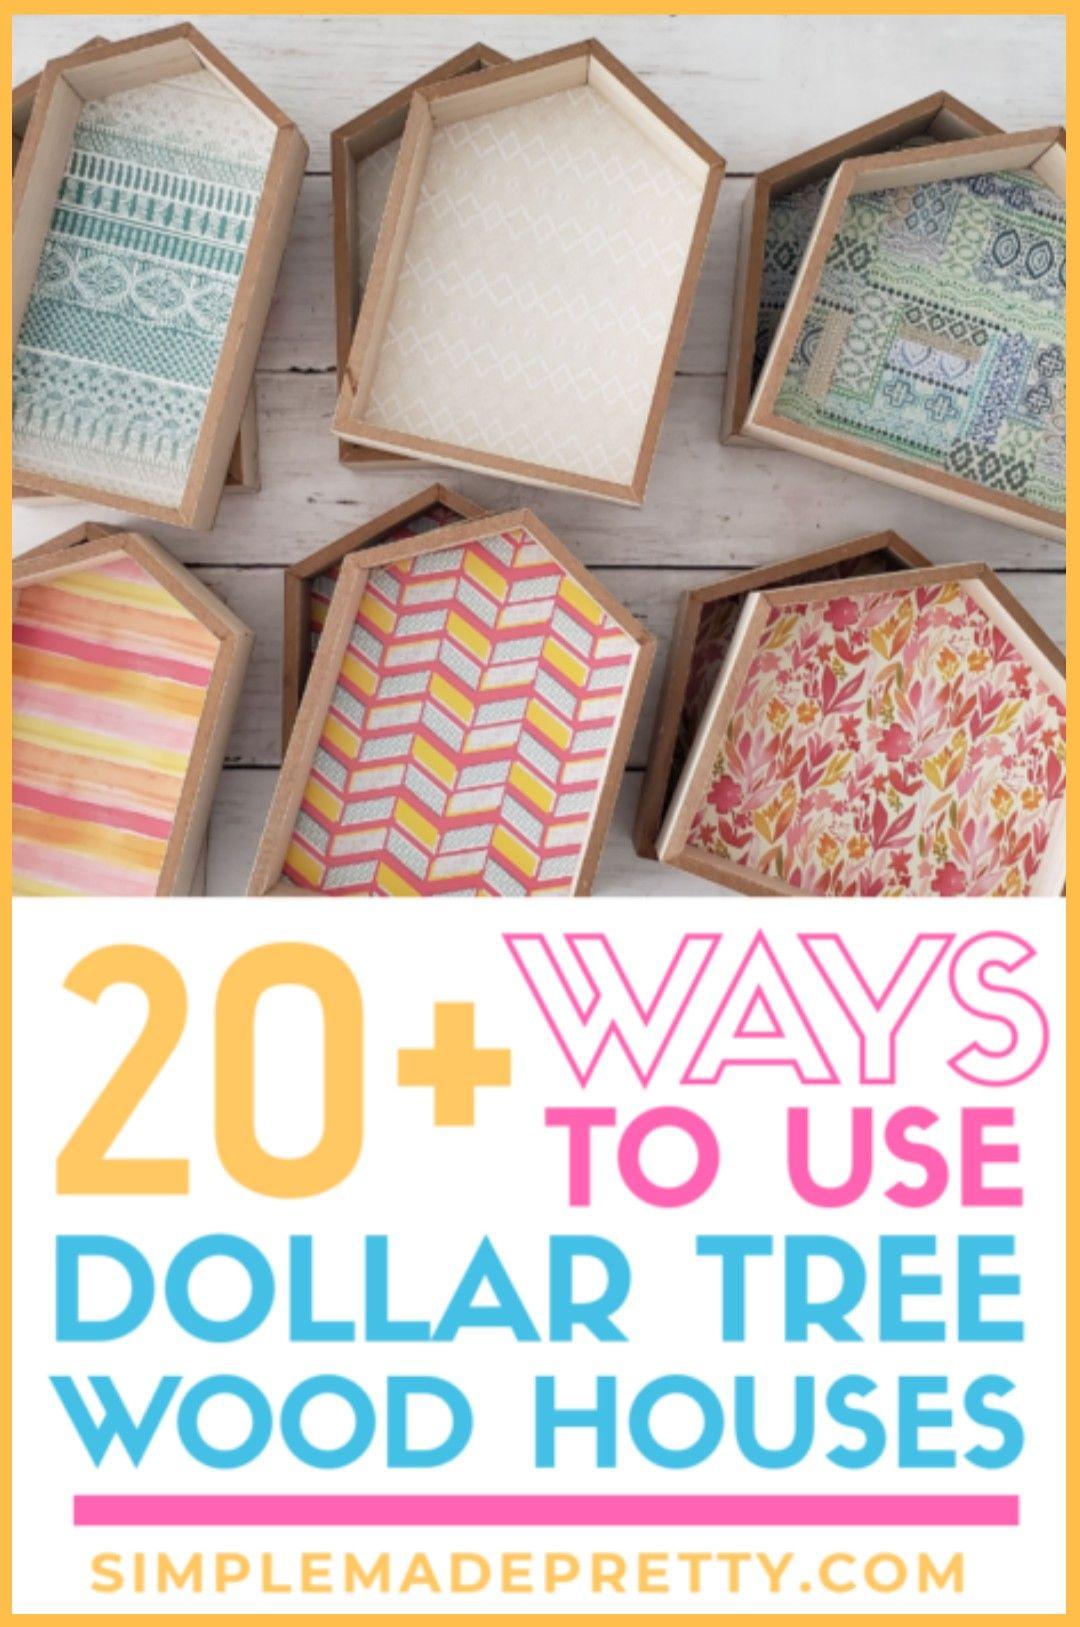 Dollar Tree Wood House DIY